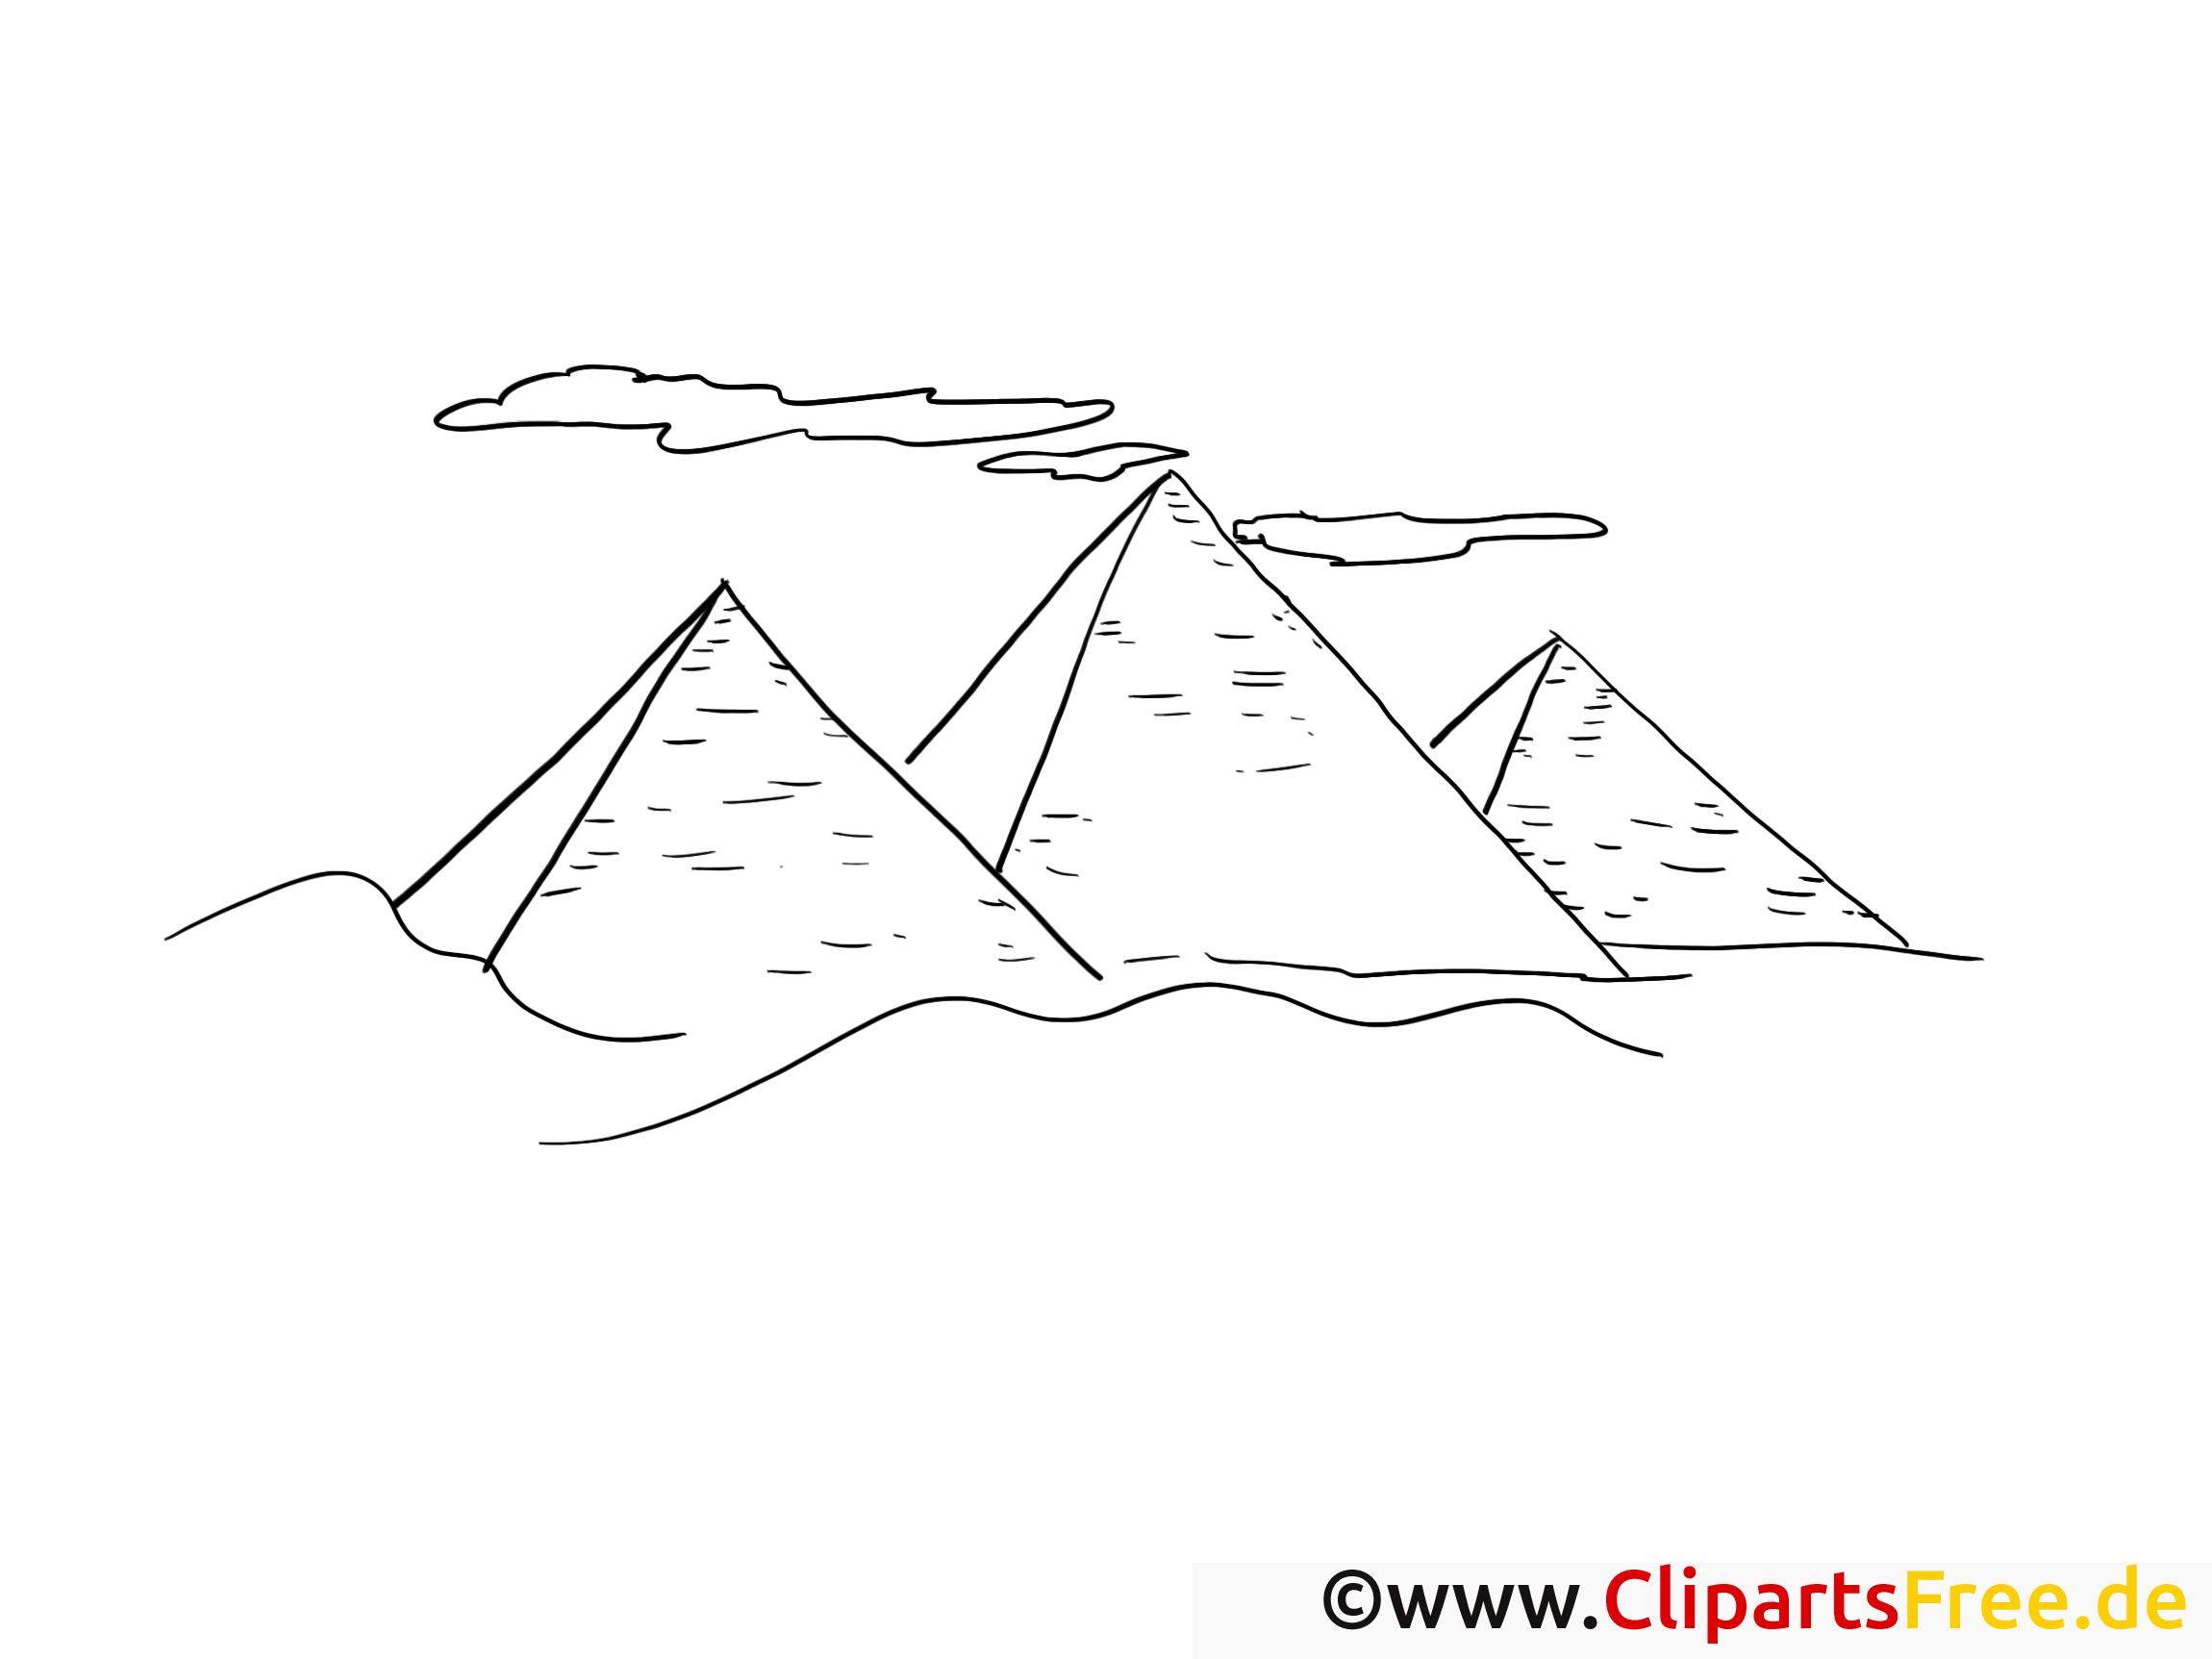 Ägypten Pyramiden Malvorlagen